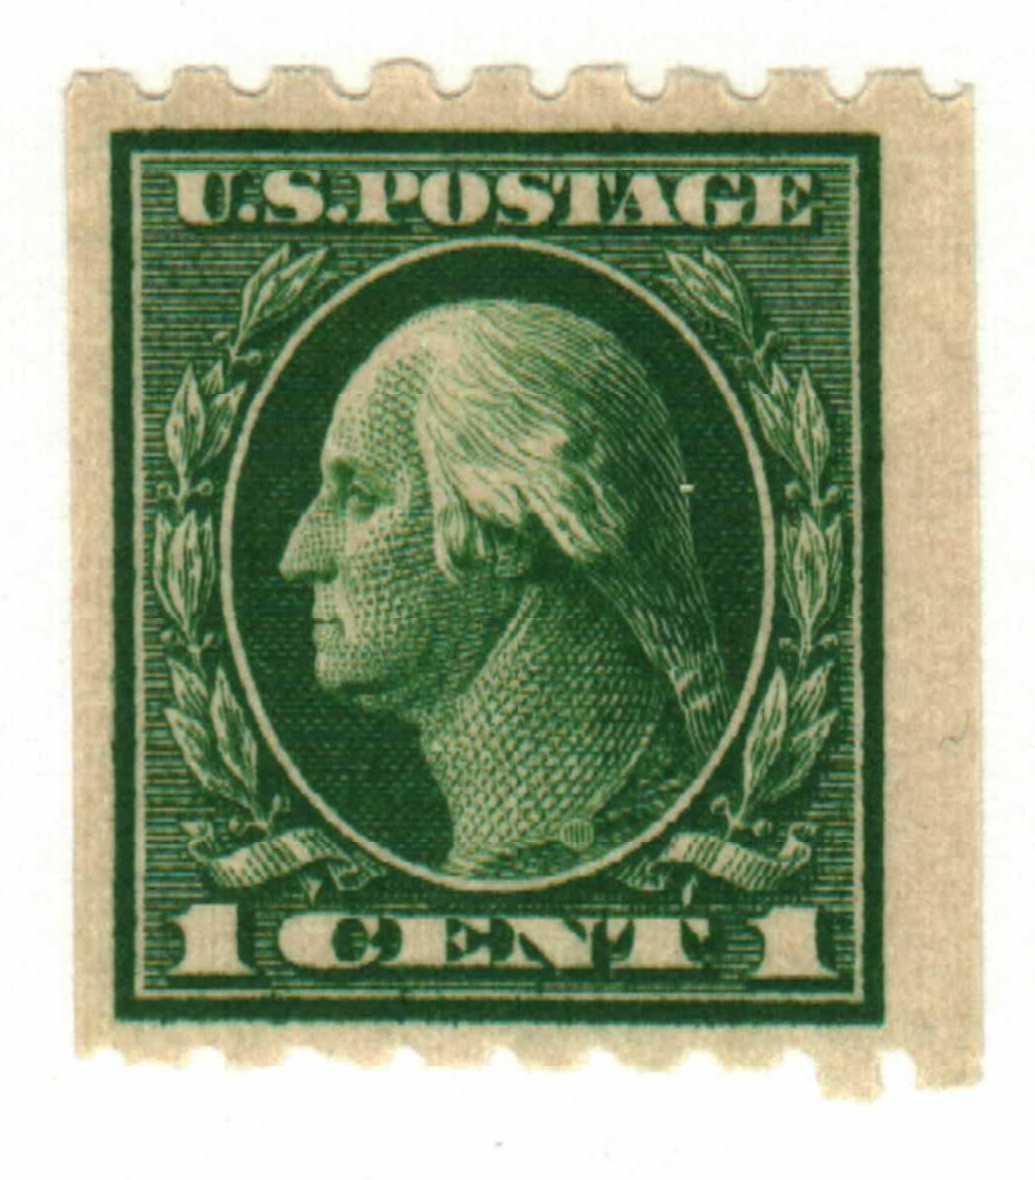 1912 1c Washington, coil, green, single watermark